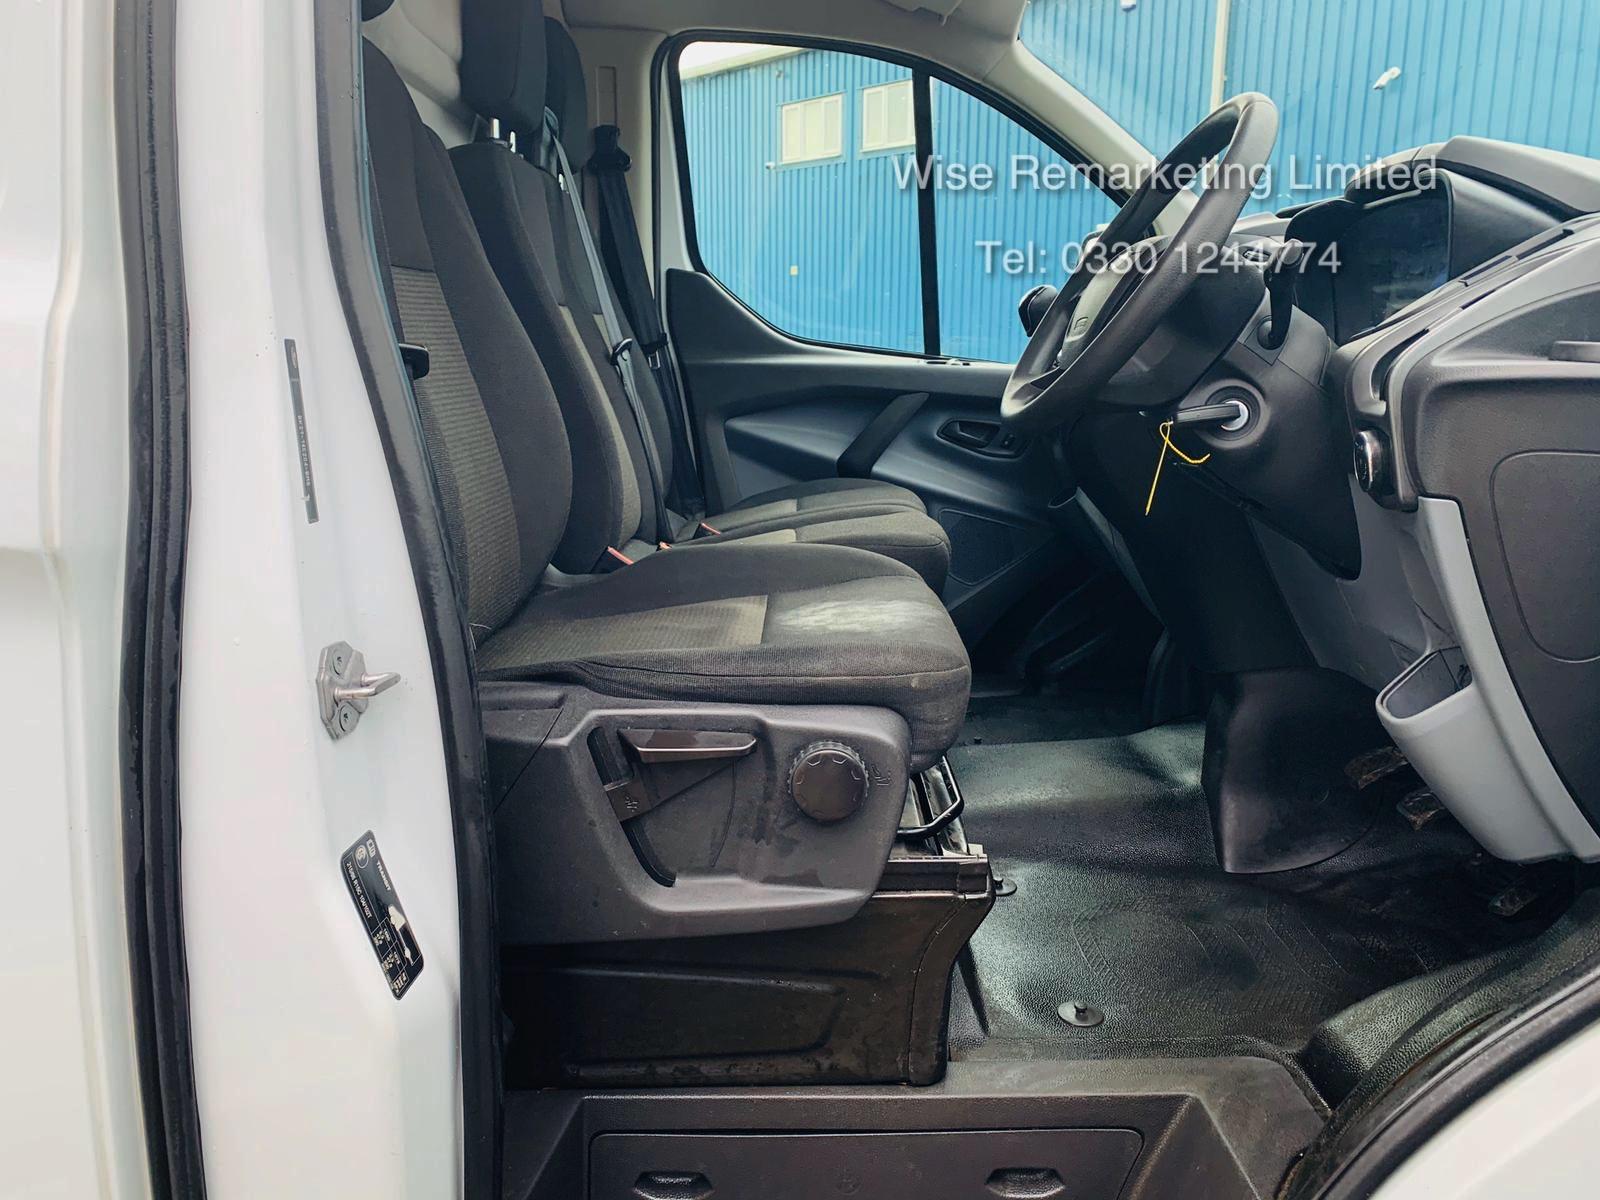 Ford Transit Custom 2.2 TDCI 290 **HIGH ROOF** - 2016 Model - AIR CON- 1 OWNER- FSH- RARE VAN!! - Image 14 of 24